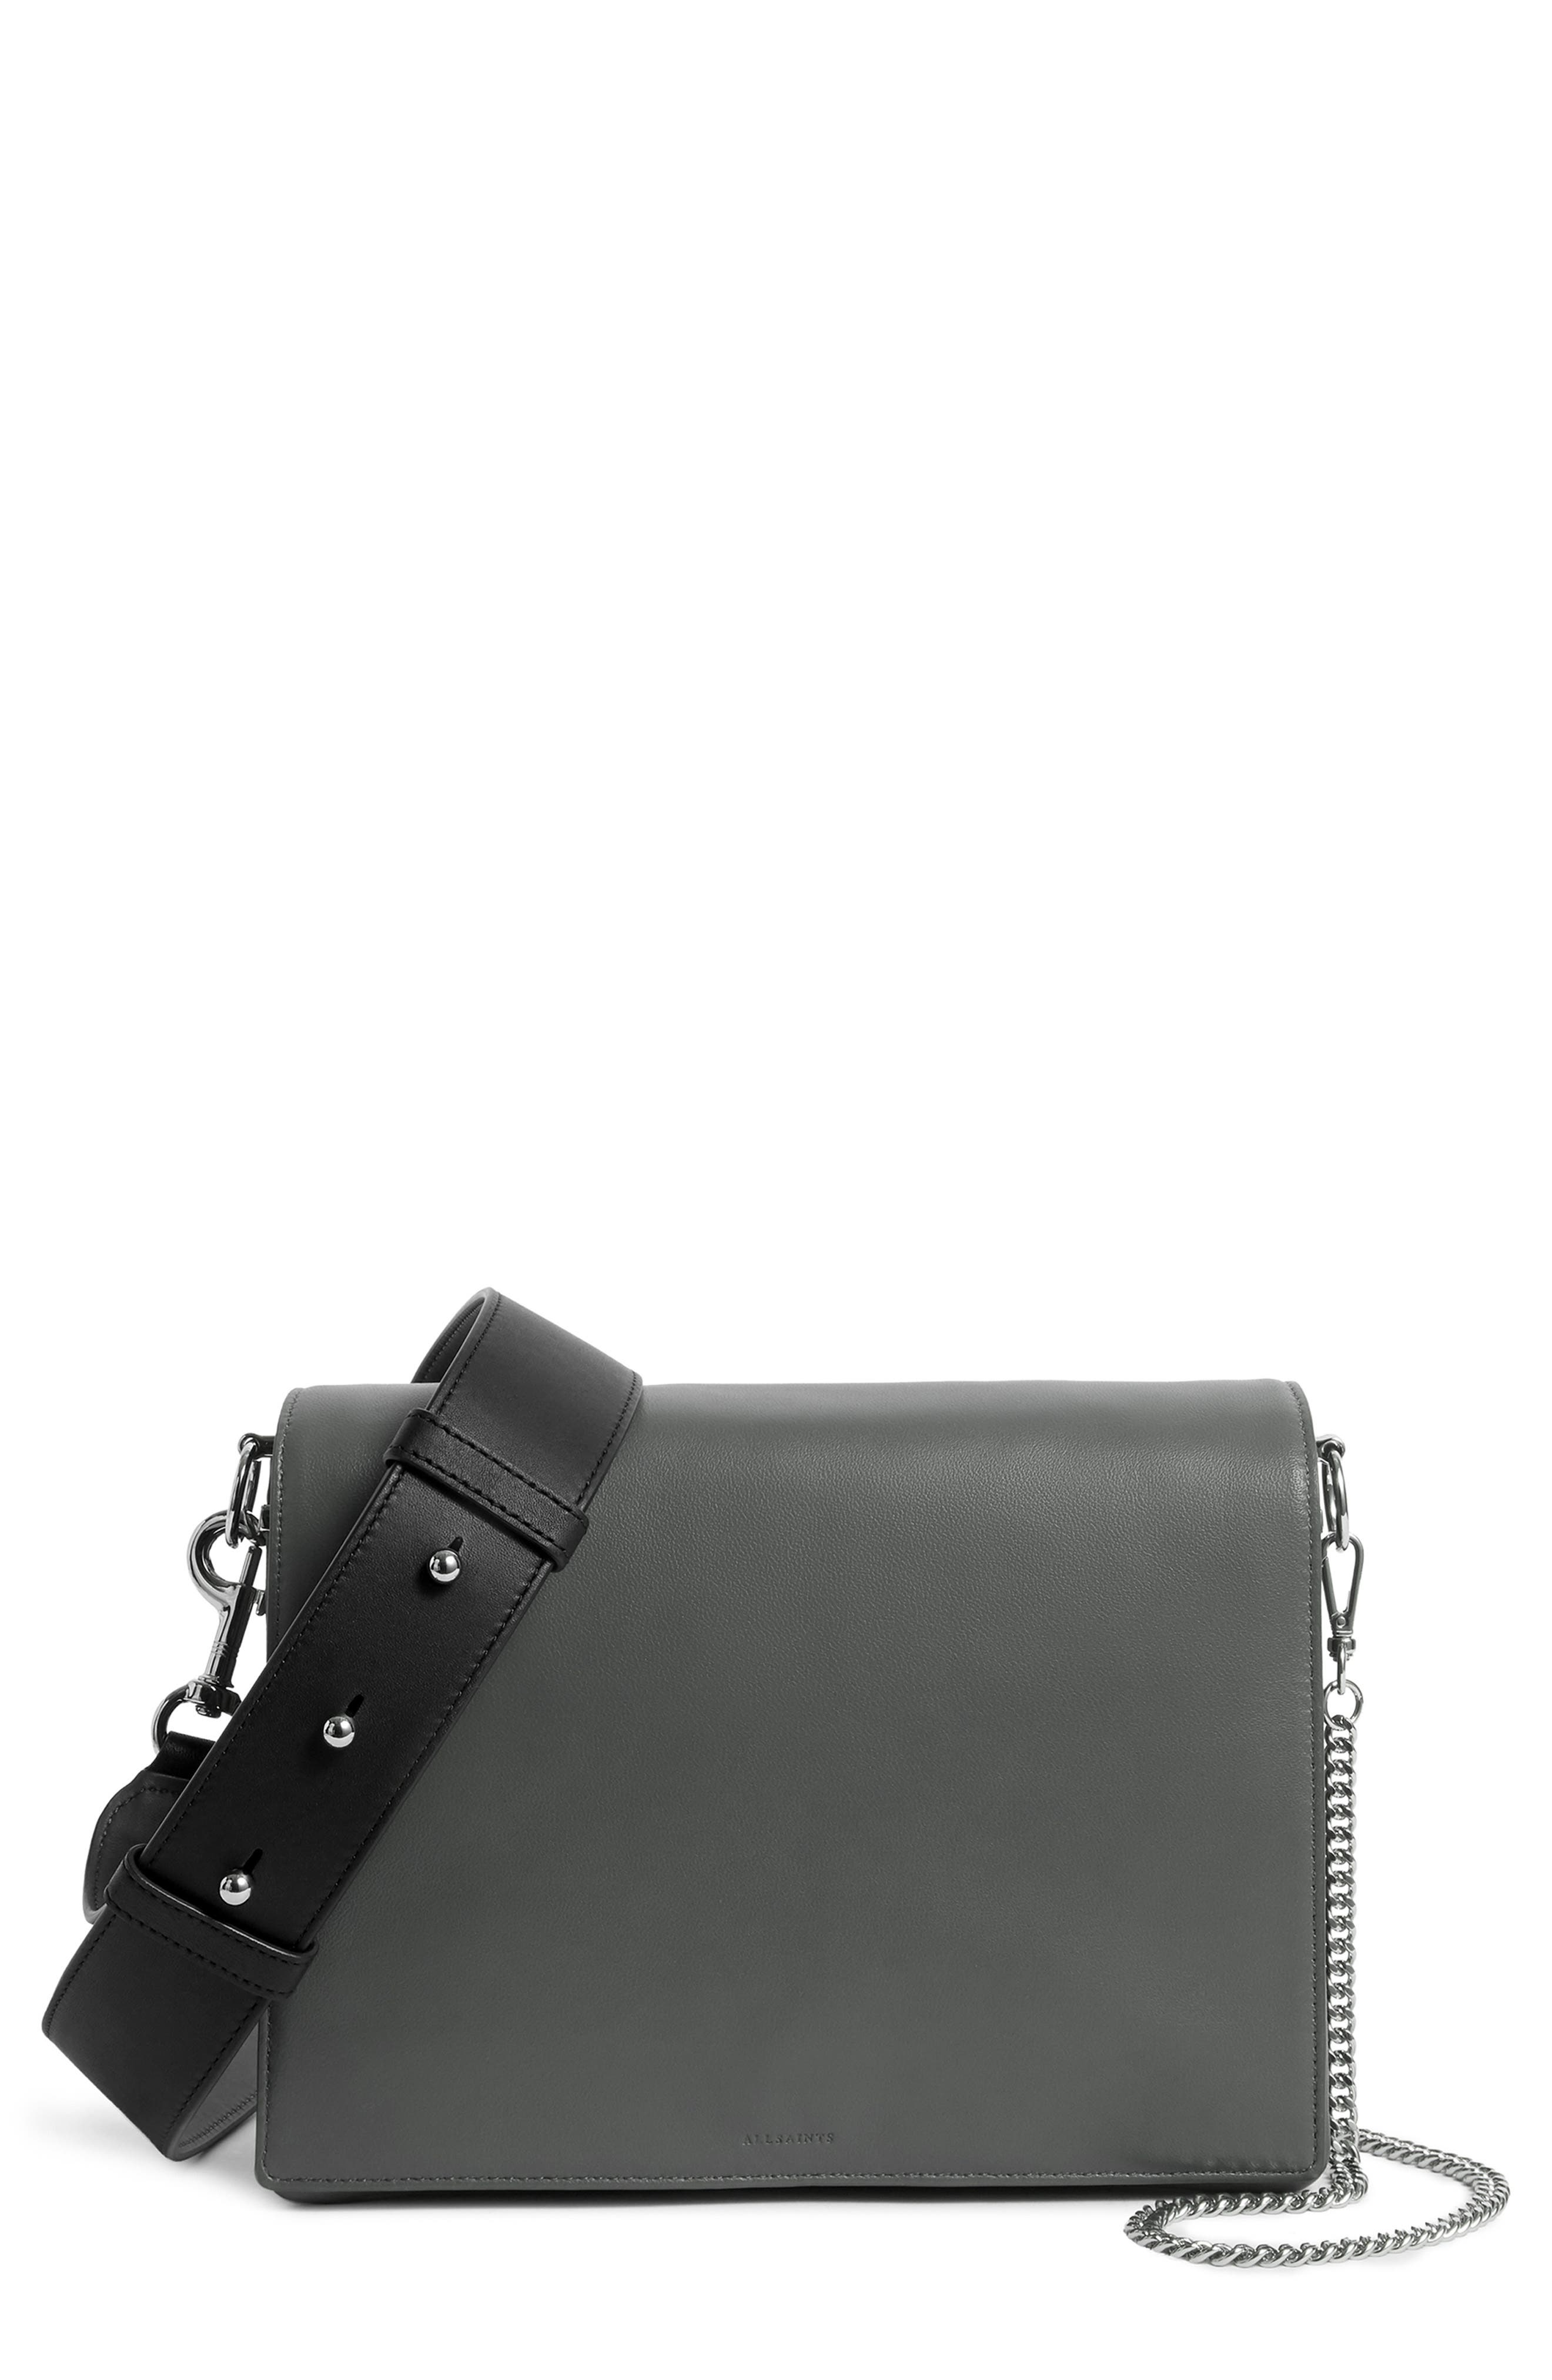 Zep Lambskin Leather Box Bag,                         Main,                         color, SMOKY BLUE/ DARK BLUE